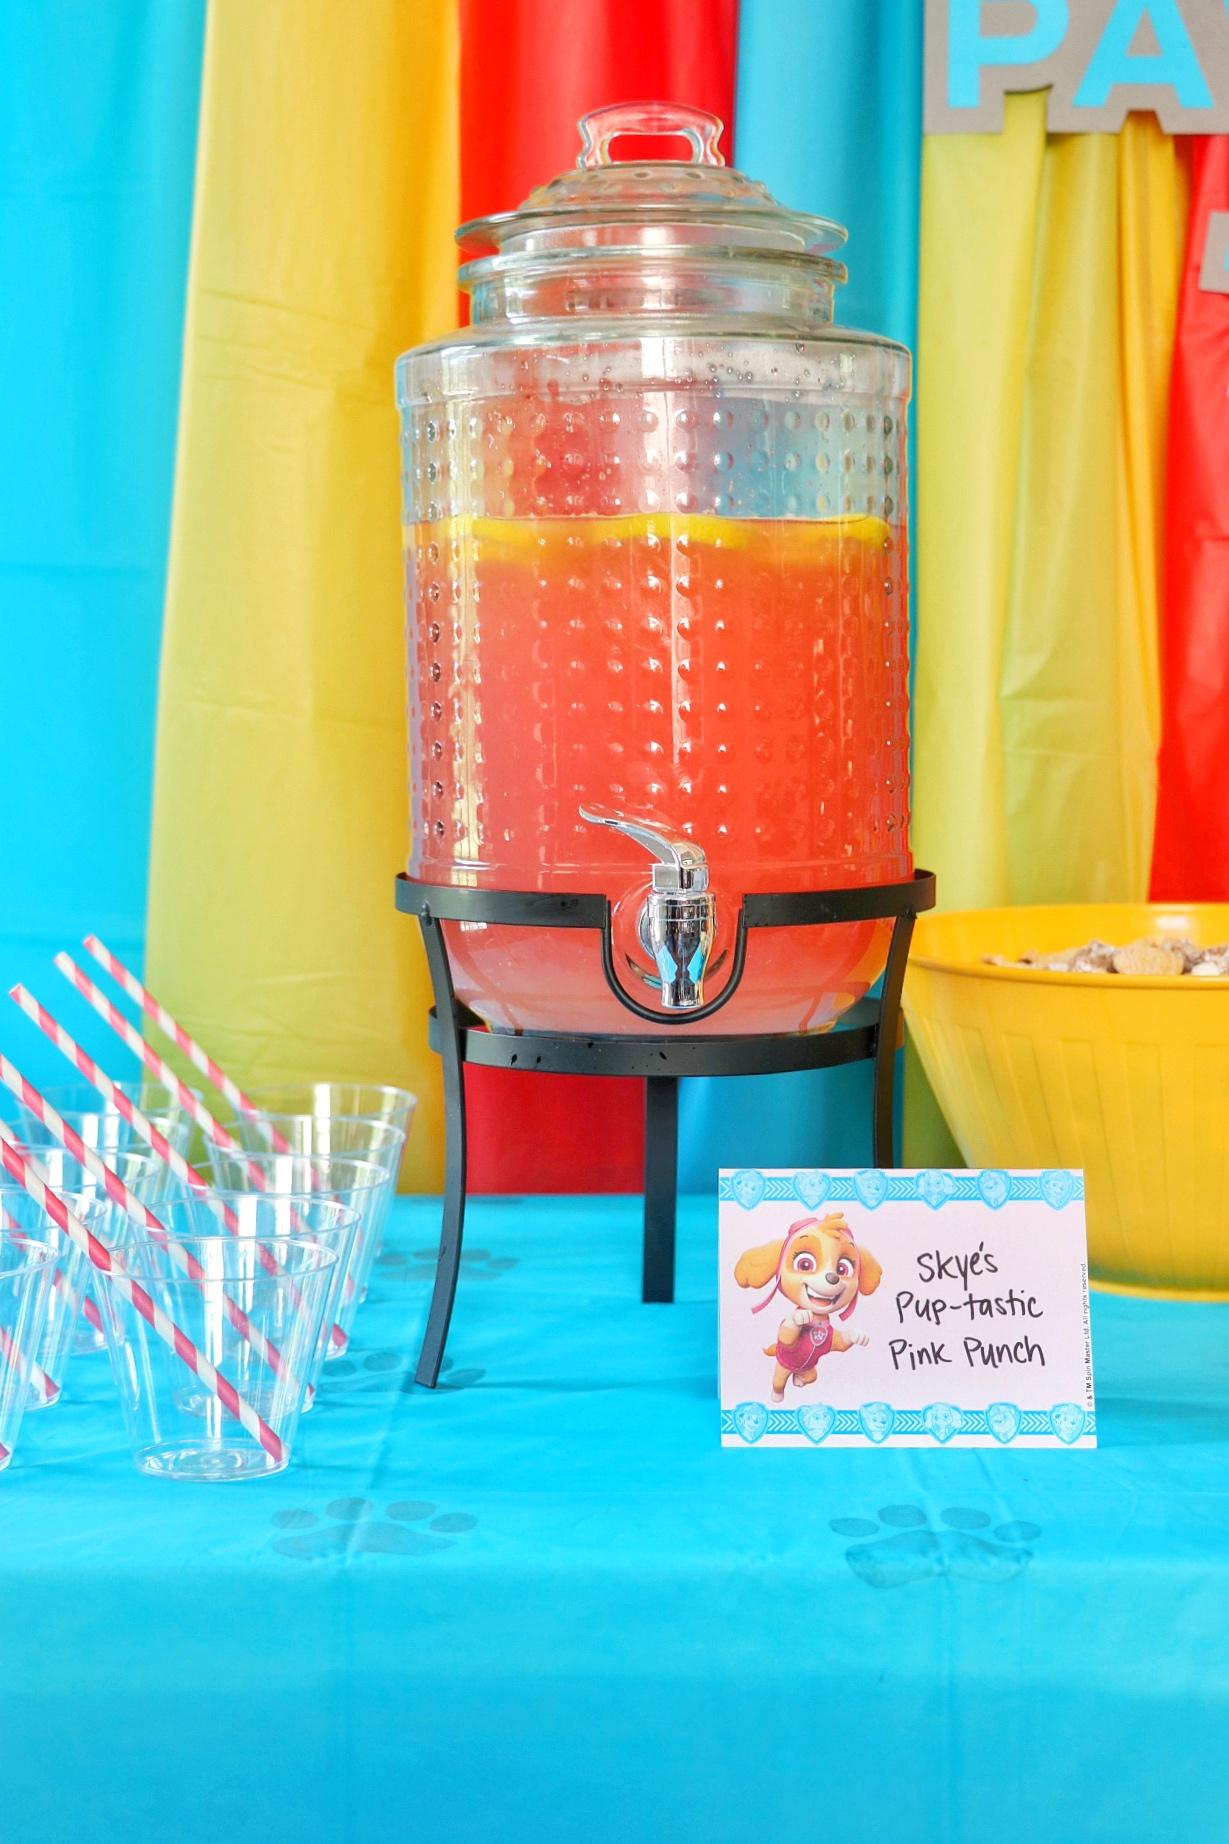 PAW Patrol birthday party ideas: Skye's Pup-tastic Pink Punch (pink lemonade recipe for a PAW Patrol birthday)